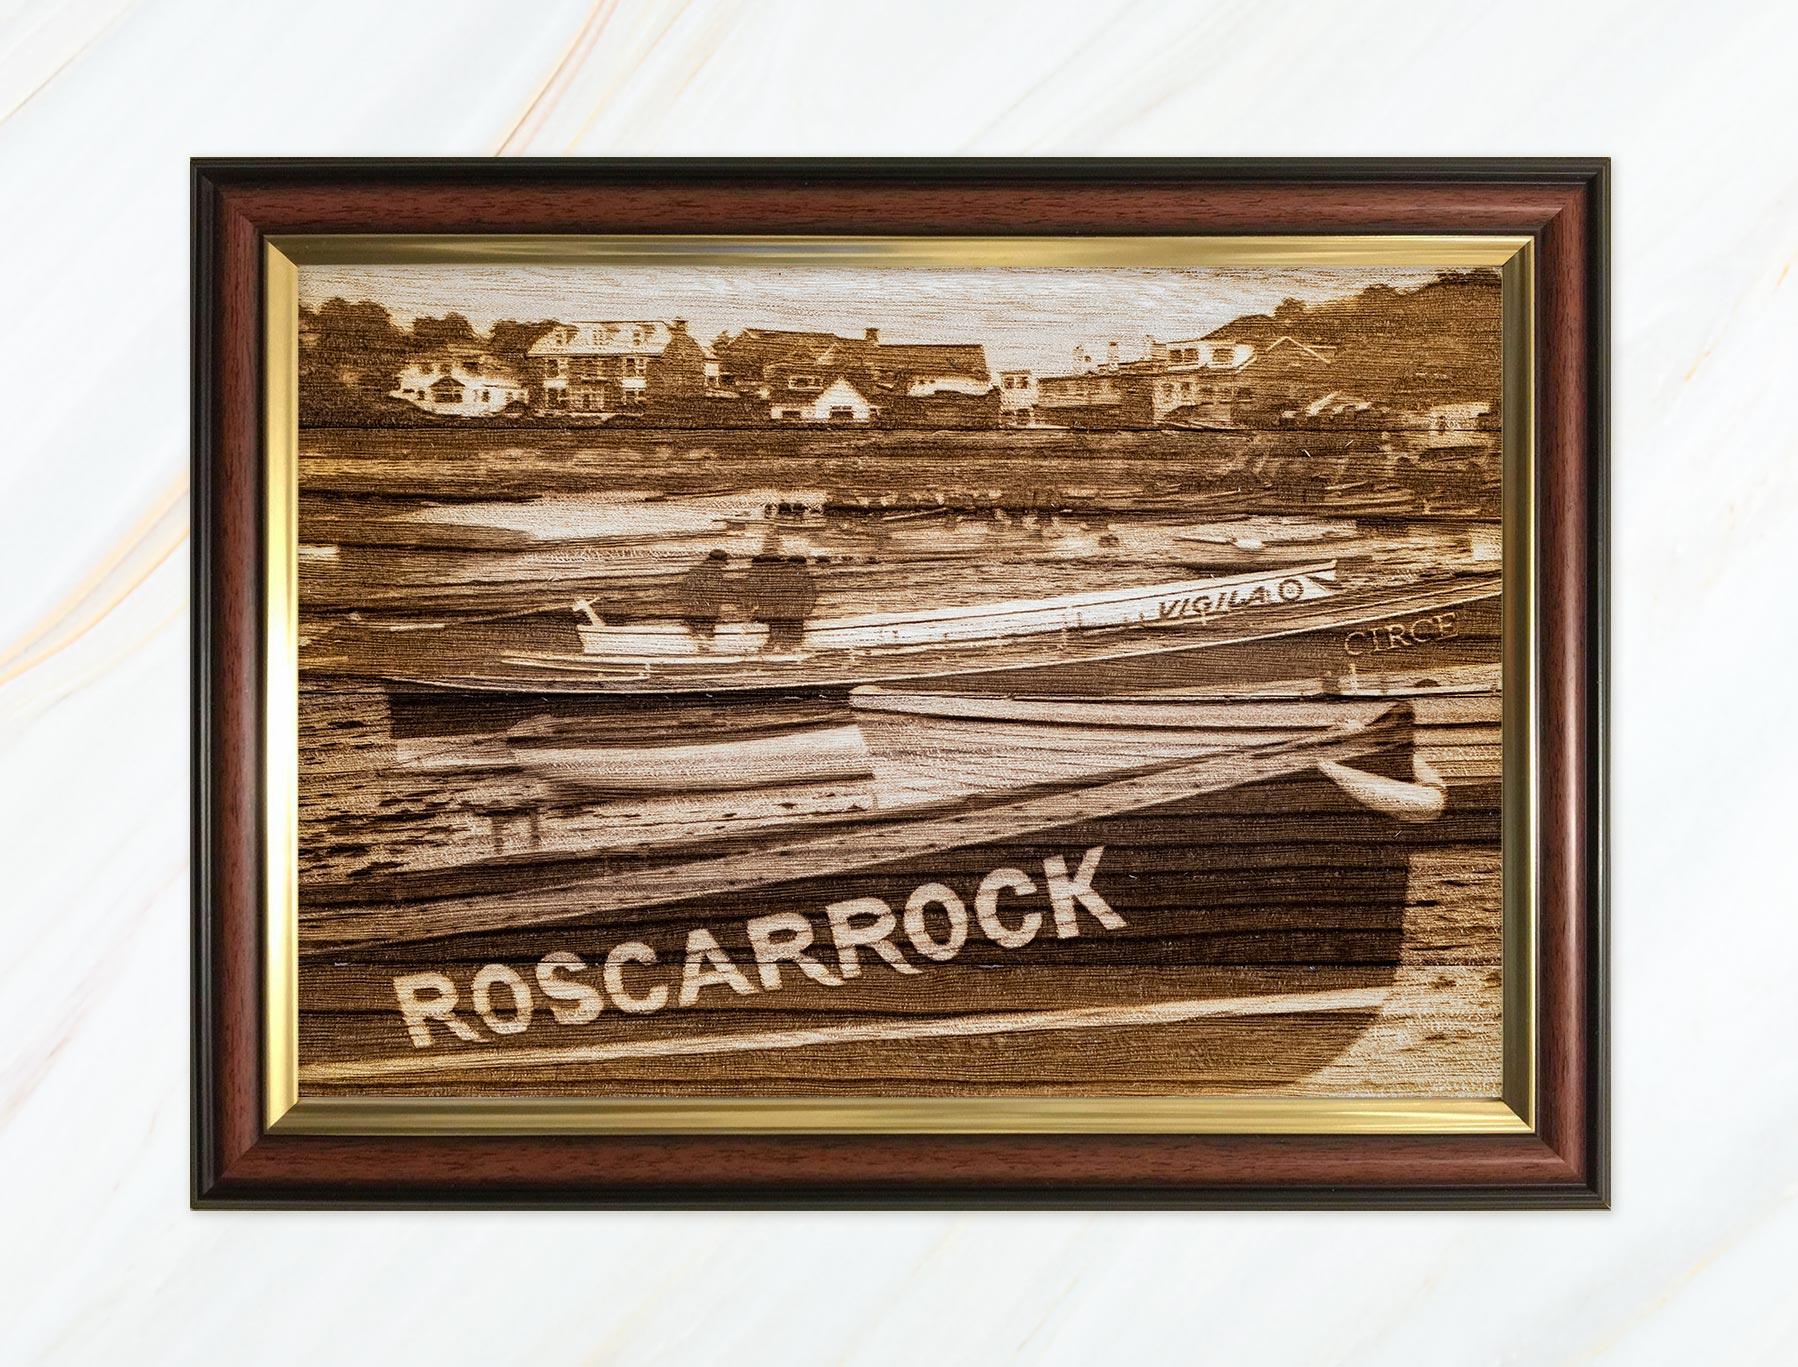 Wooden pyrograph of Roscarrock